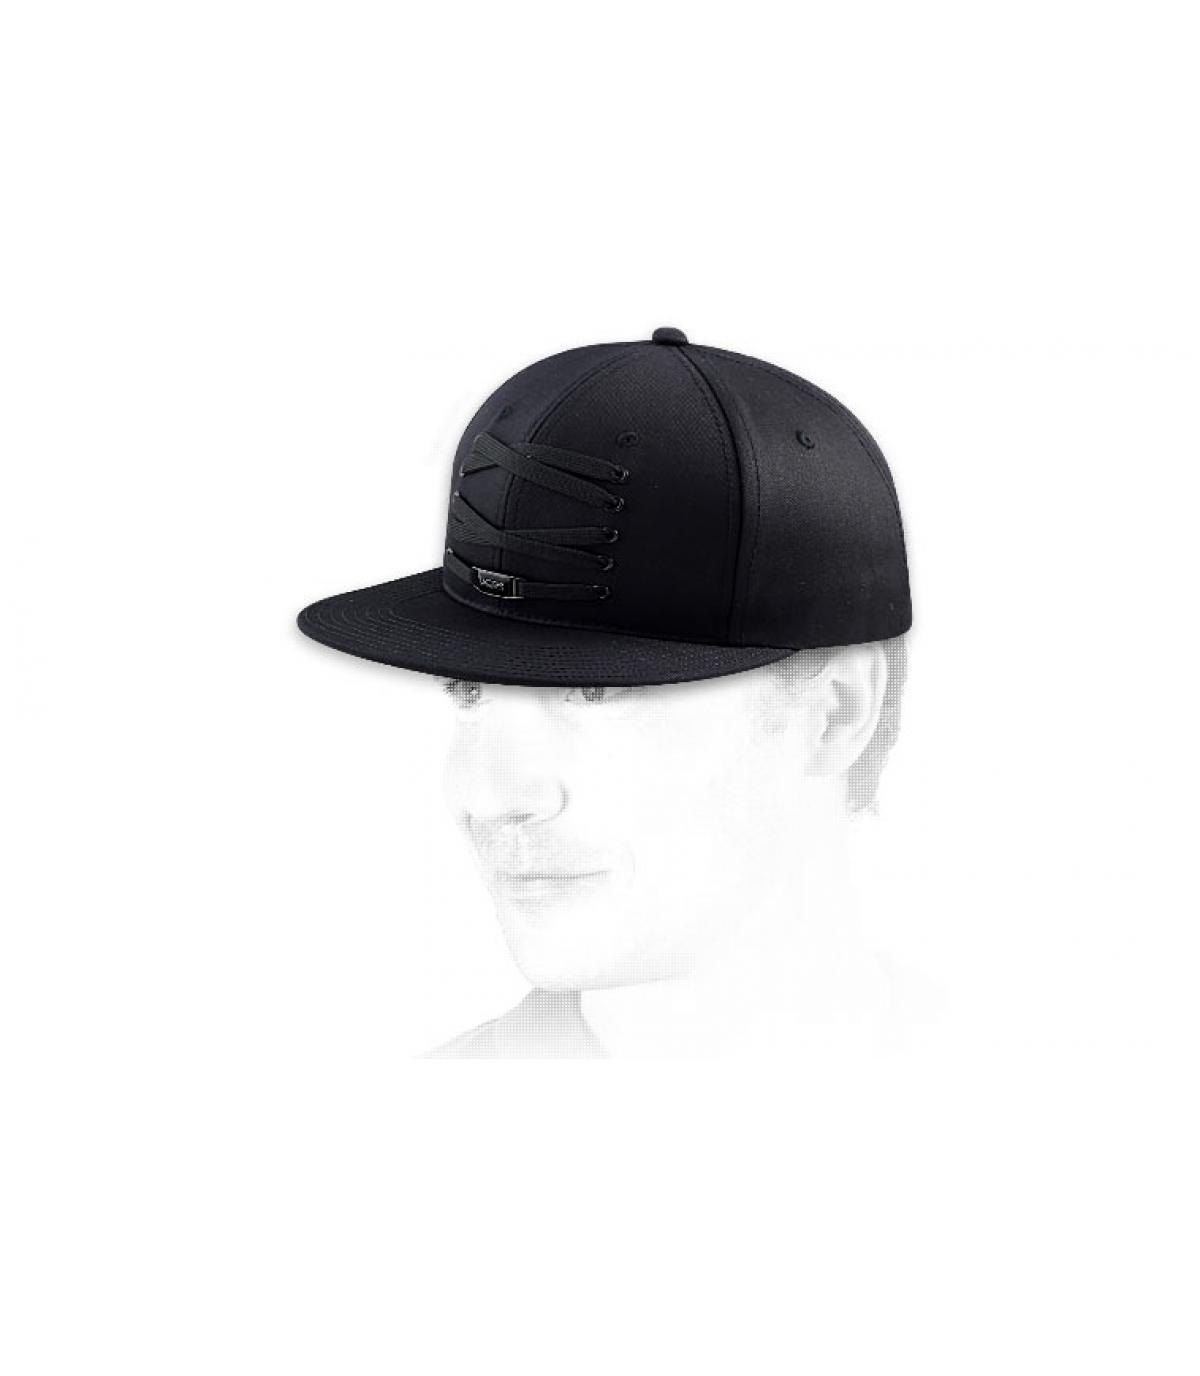 Cappellino Lacer lacets nero